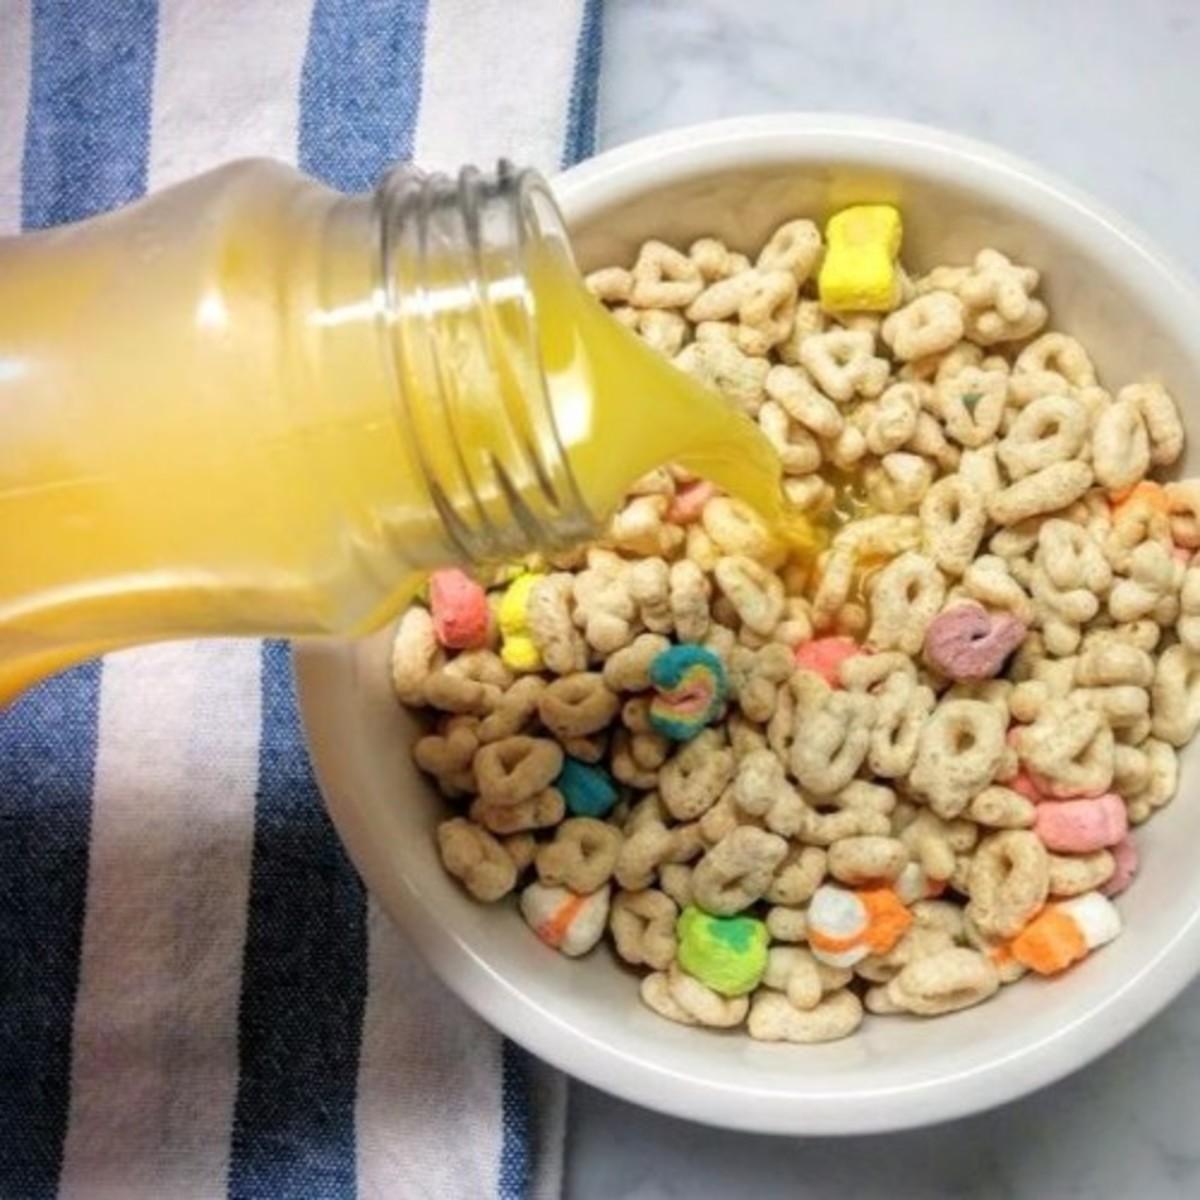 the-blursed-flavor-combinations